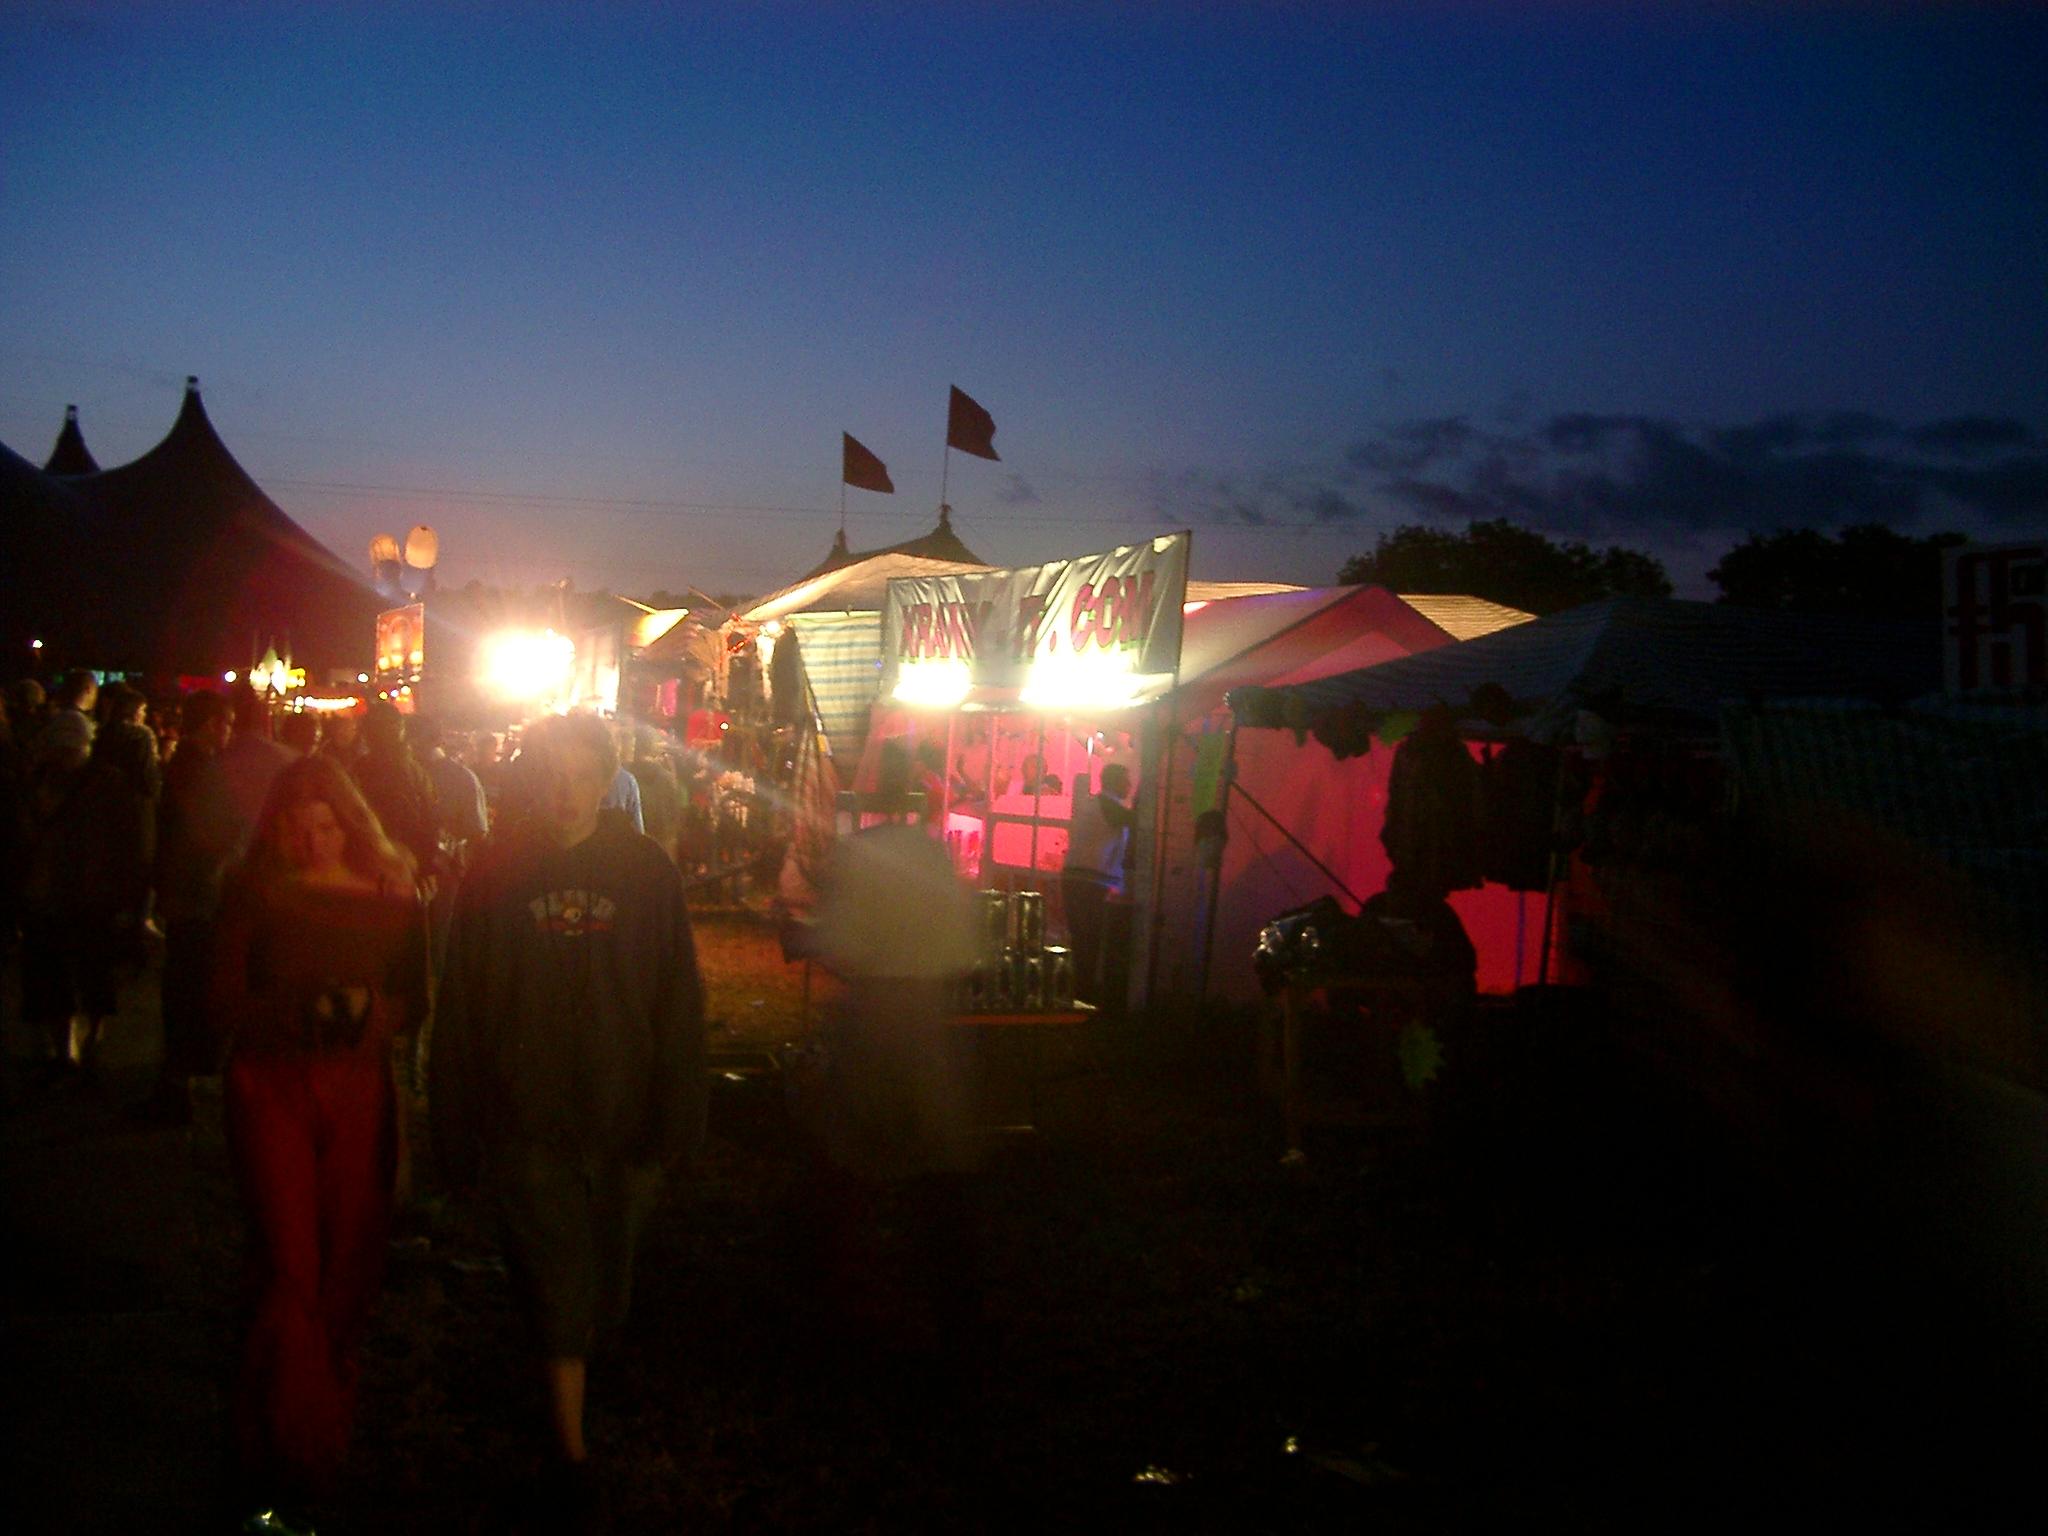 Stalls at night, Glastonbury. (JAMES FLINT)